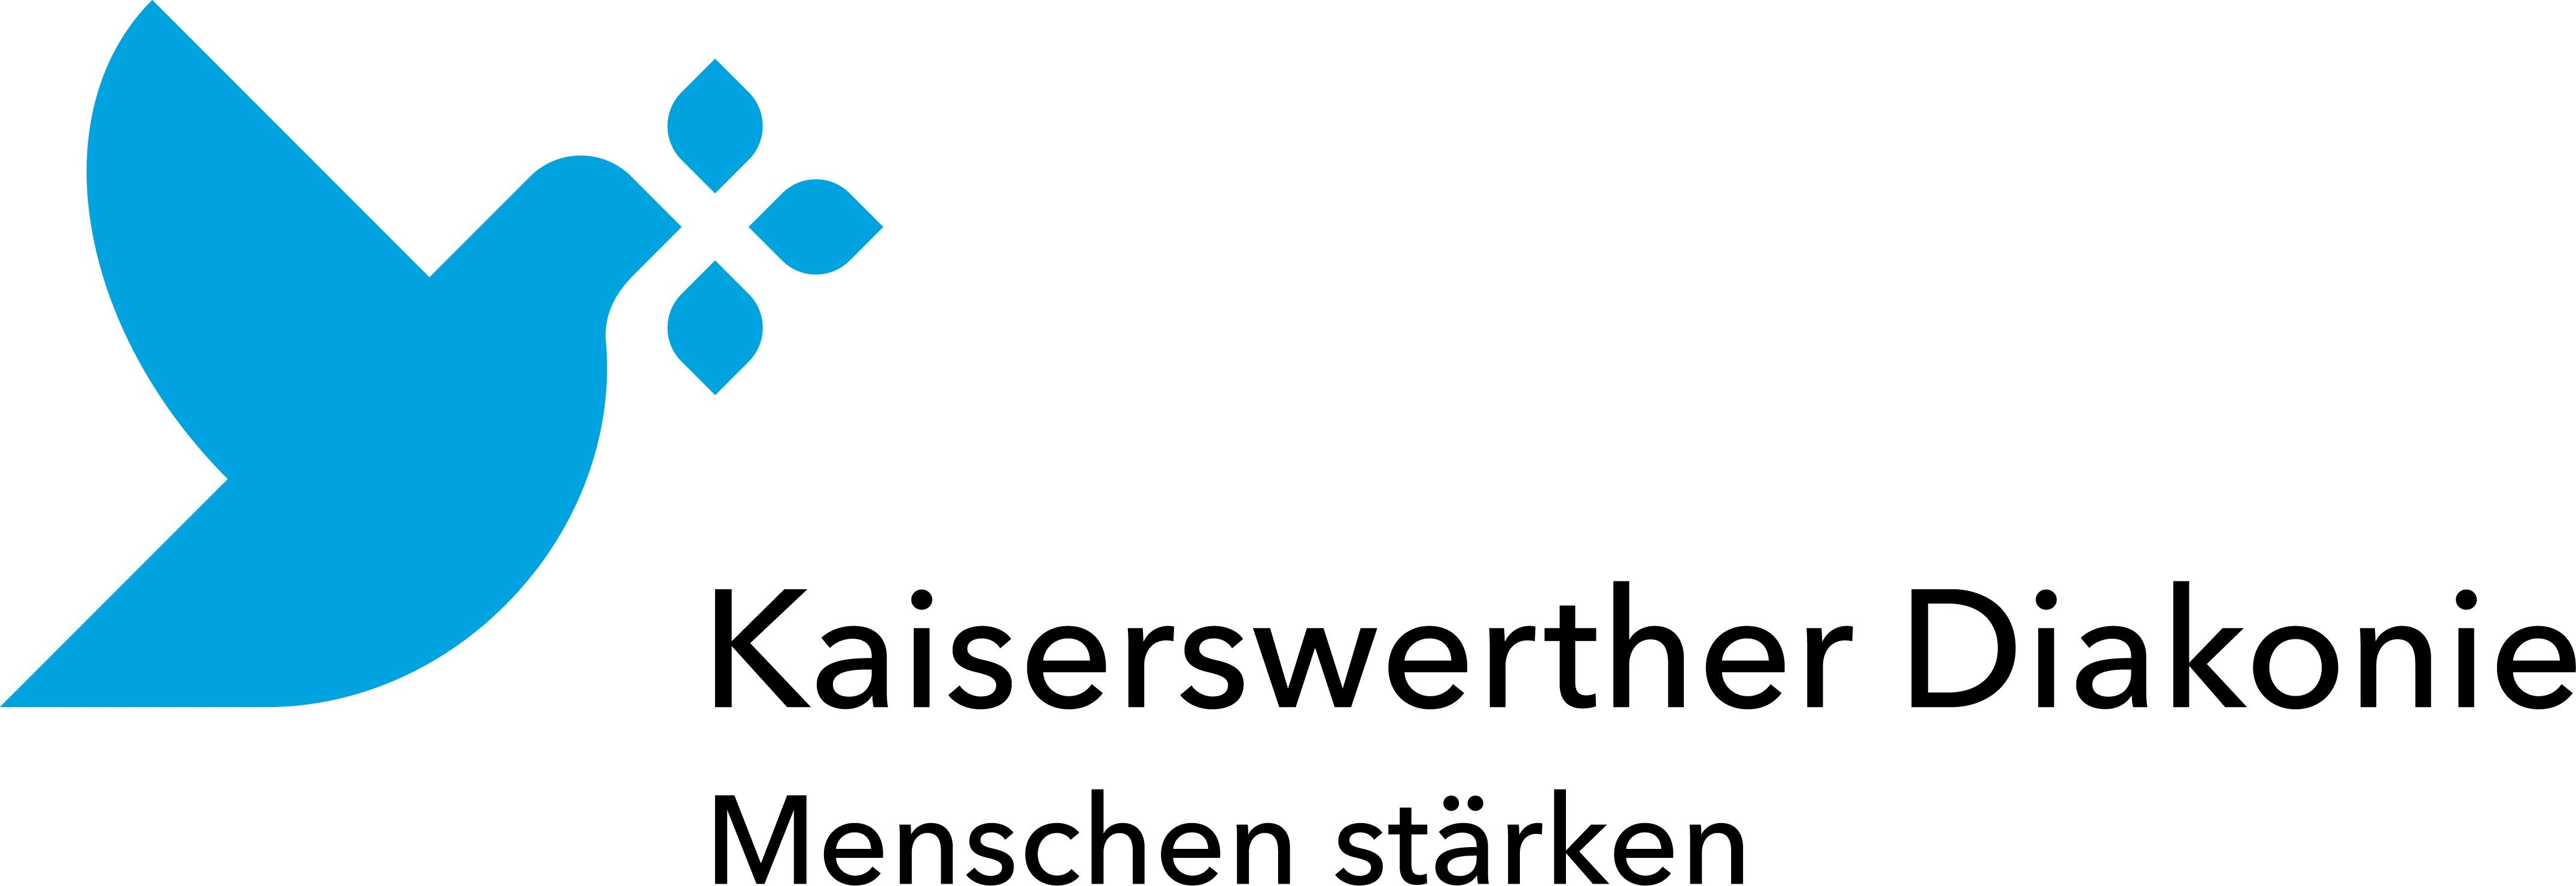 Logo: Kaiserswerther Diakonie